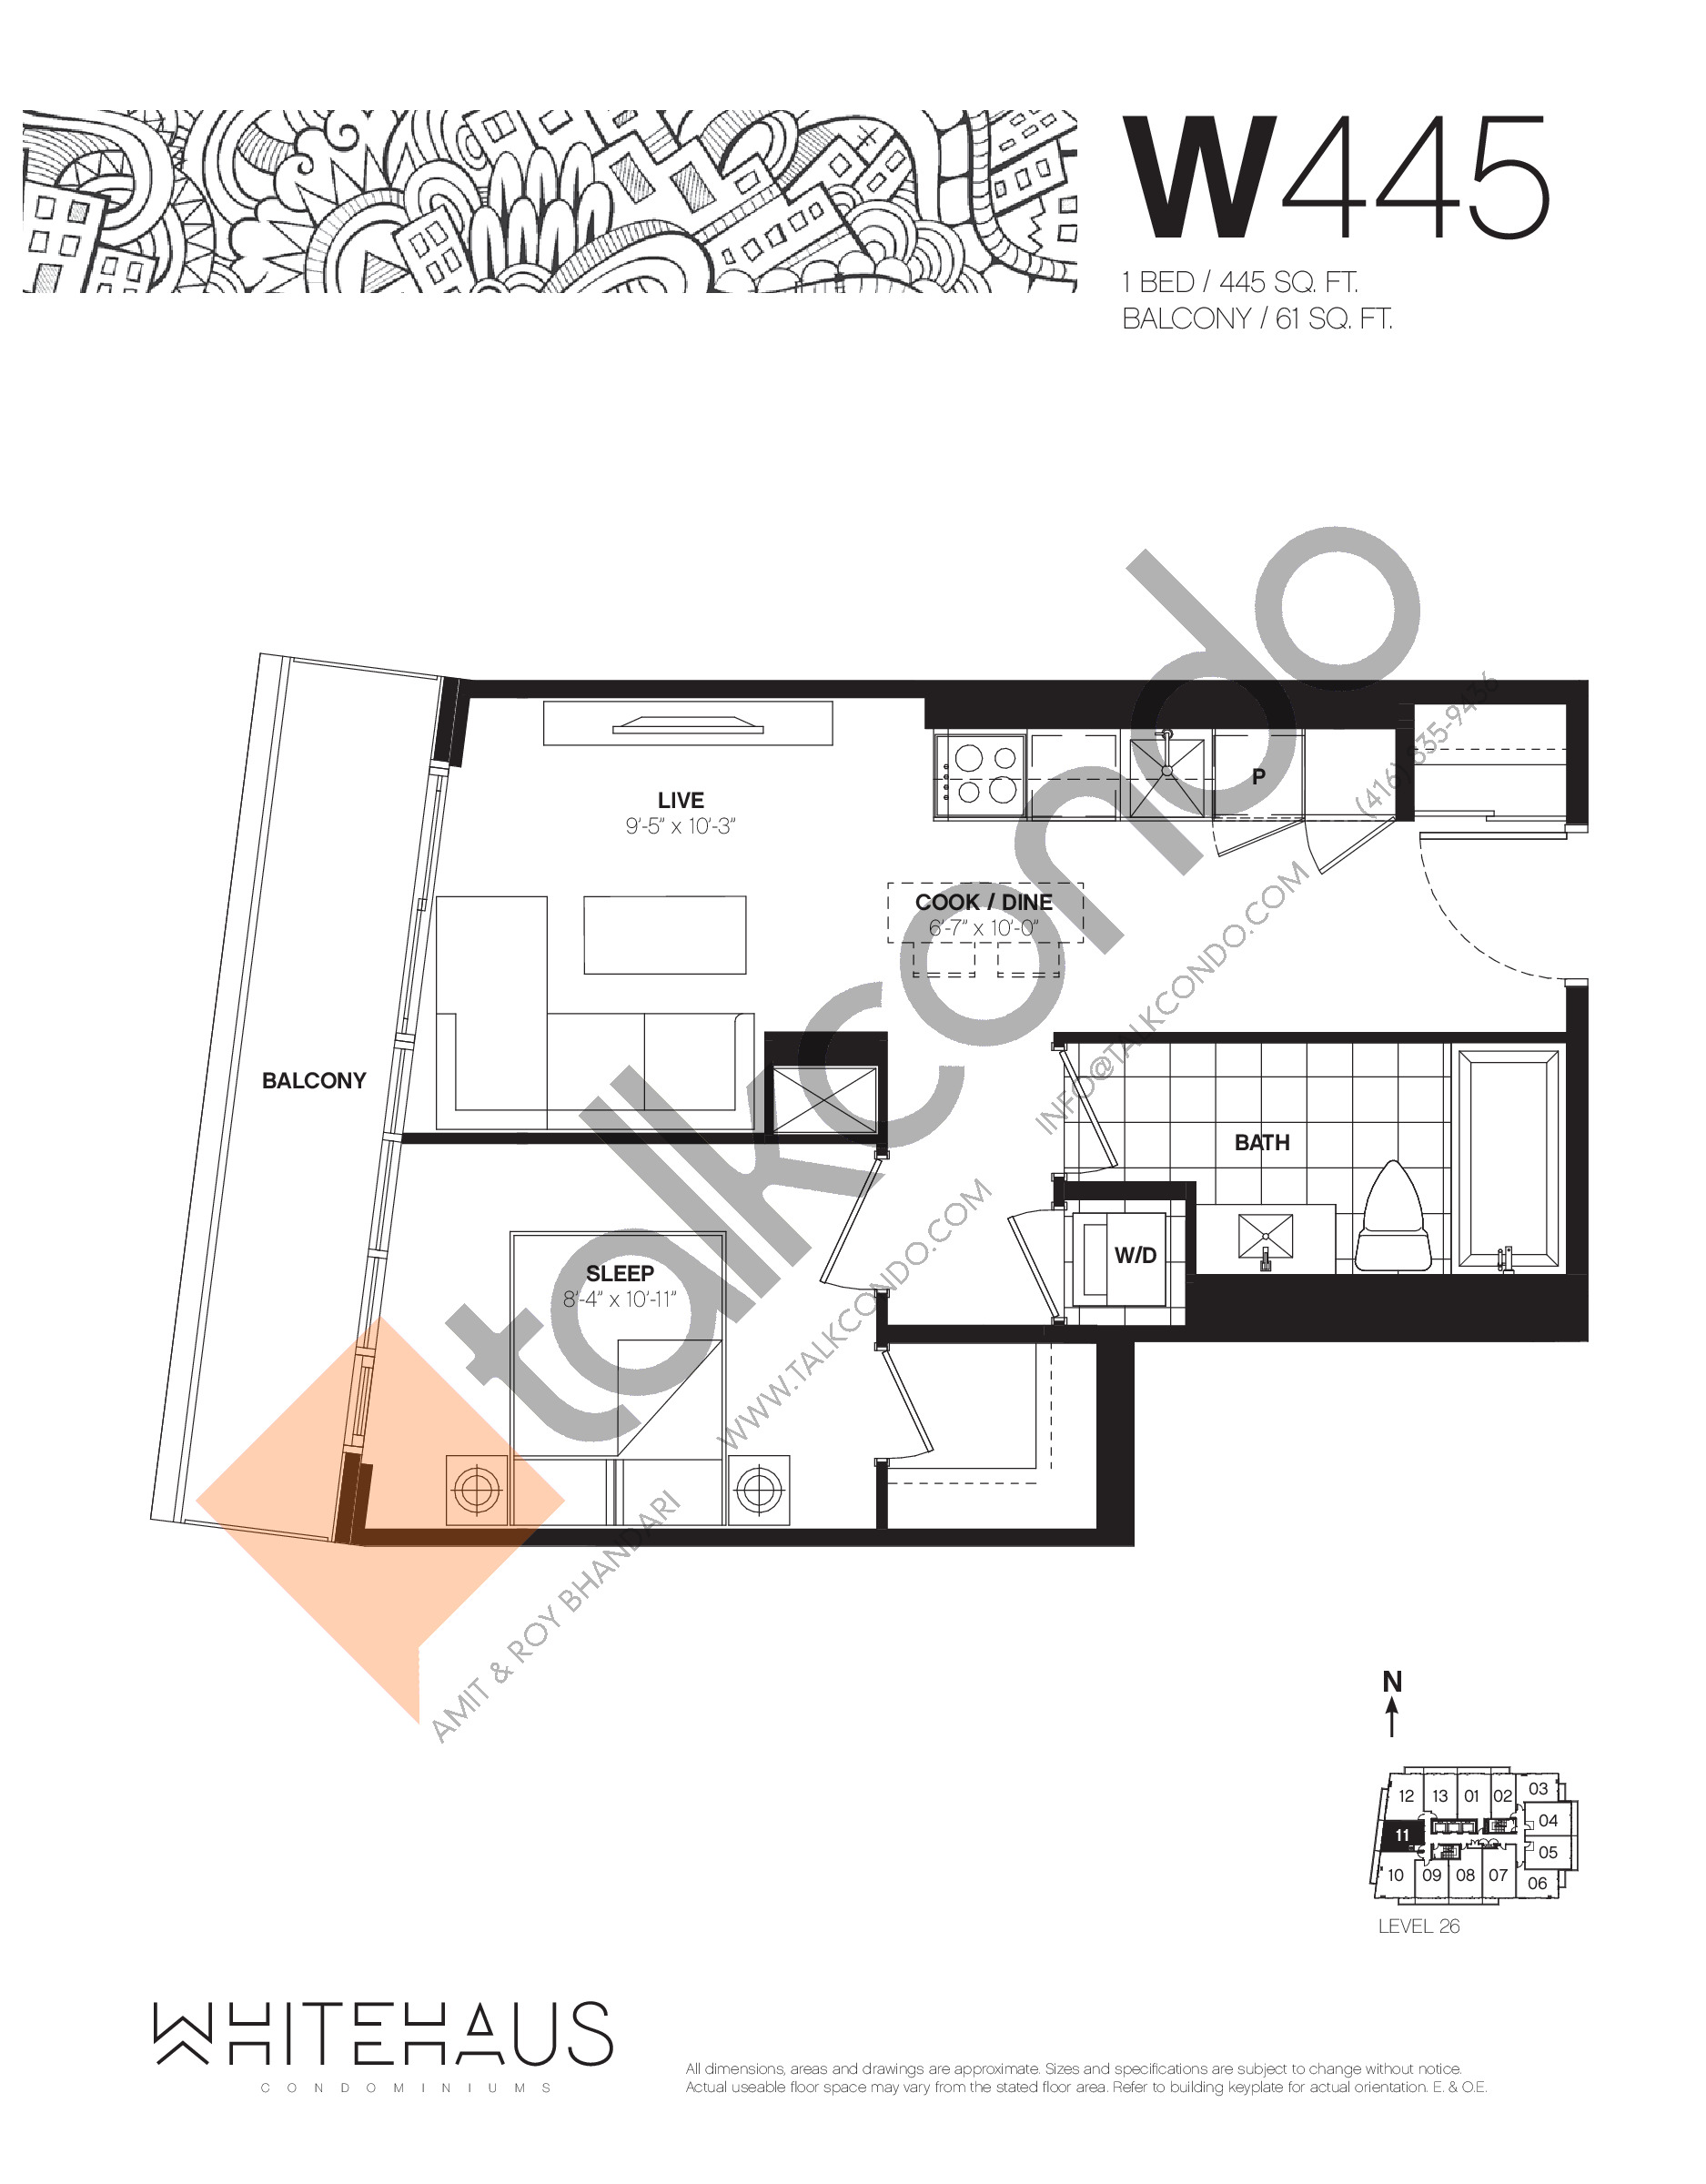 W445 Floor Plan at Whitehaus Condos - 445 sq.ft